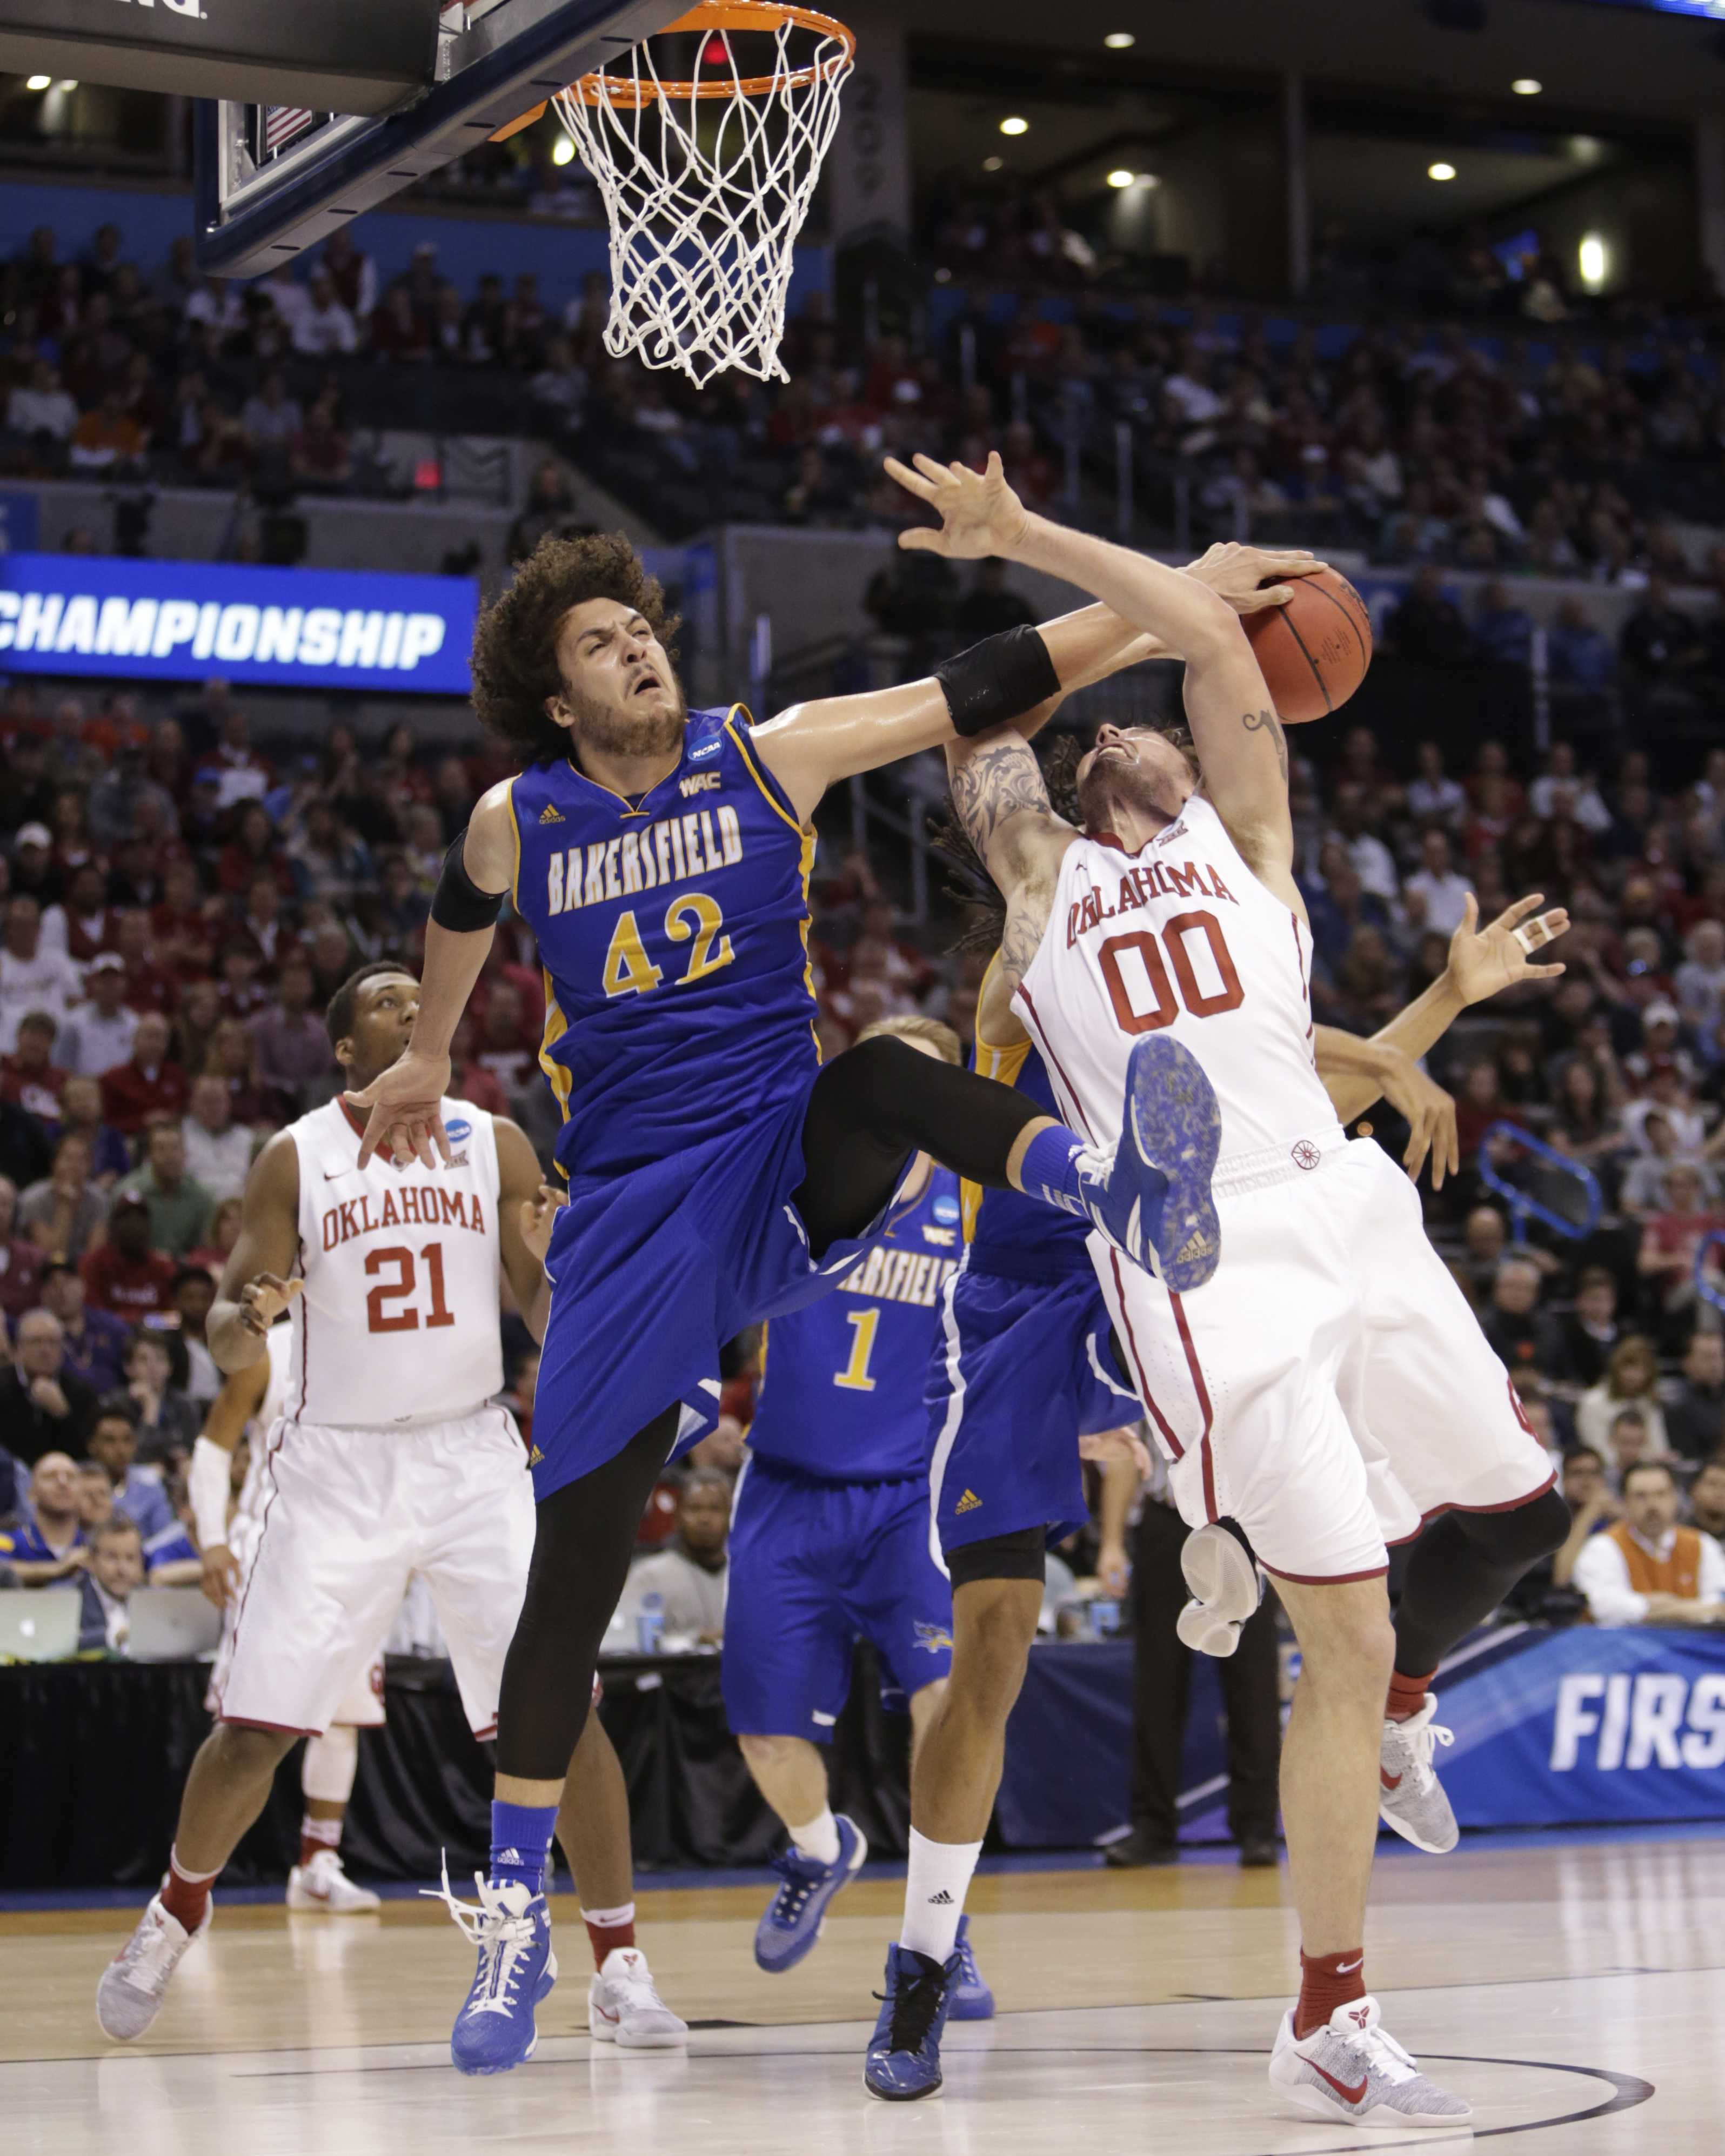 CSUB's Aly Ahmed blocks Oklahoma's Ryan Spangler shot during Friday's NCAA Division I Men's Basketball Tournament first round game. Photo by AJ Alvarado/The Runner